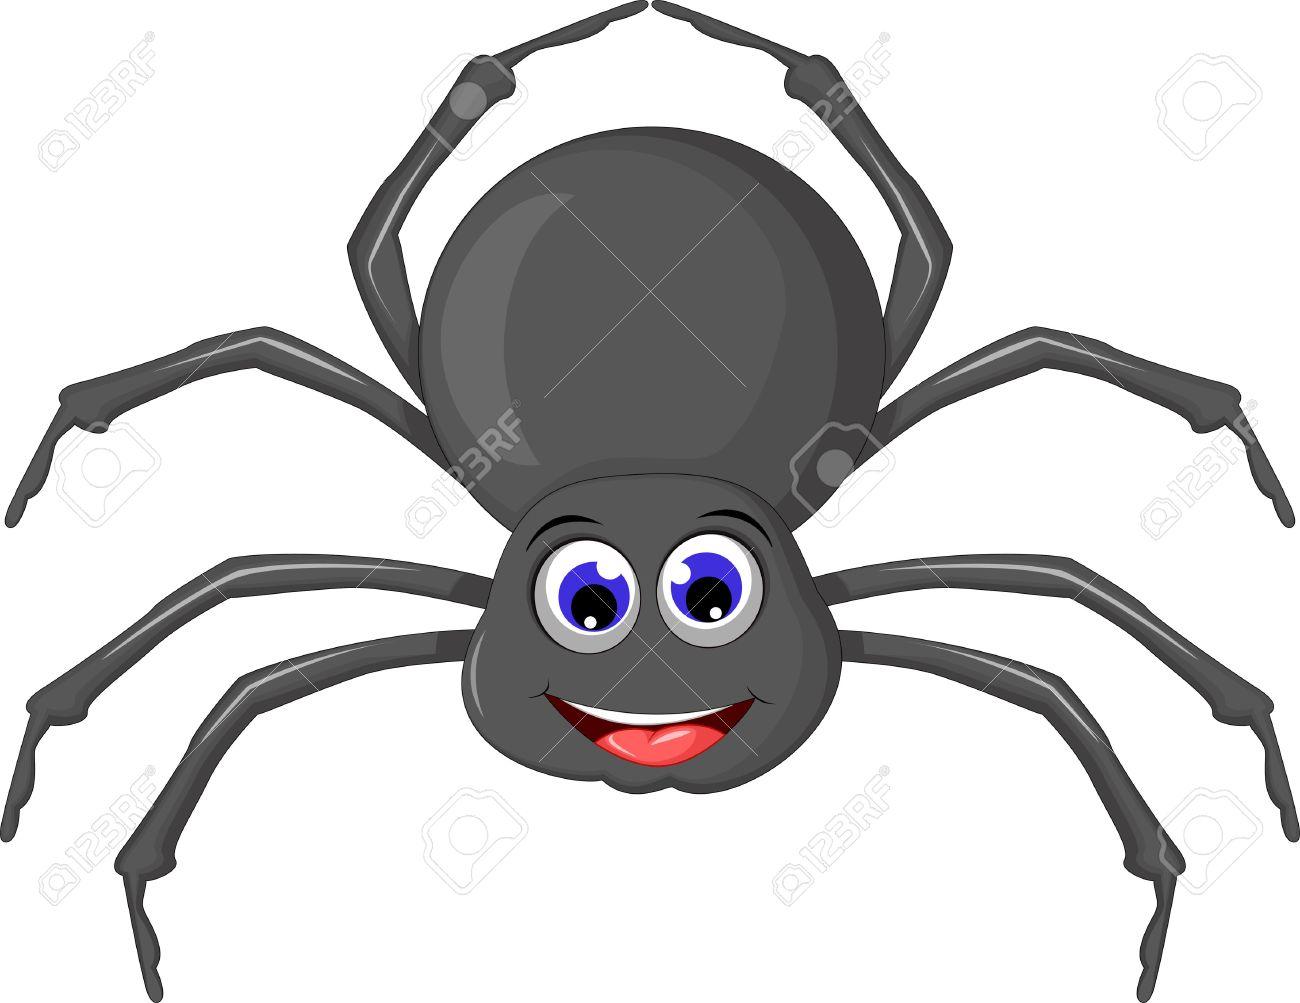 cute spider cartoon royalty free cliparts vectors and stock rh 123rf com cartoon spider monkey cartoon spider images